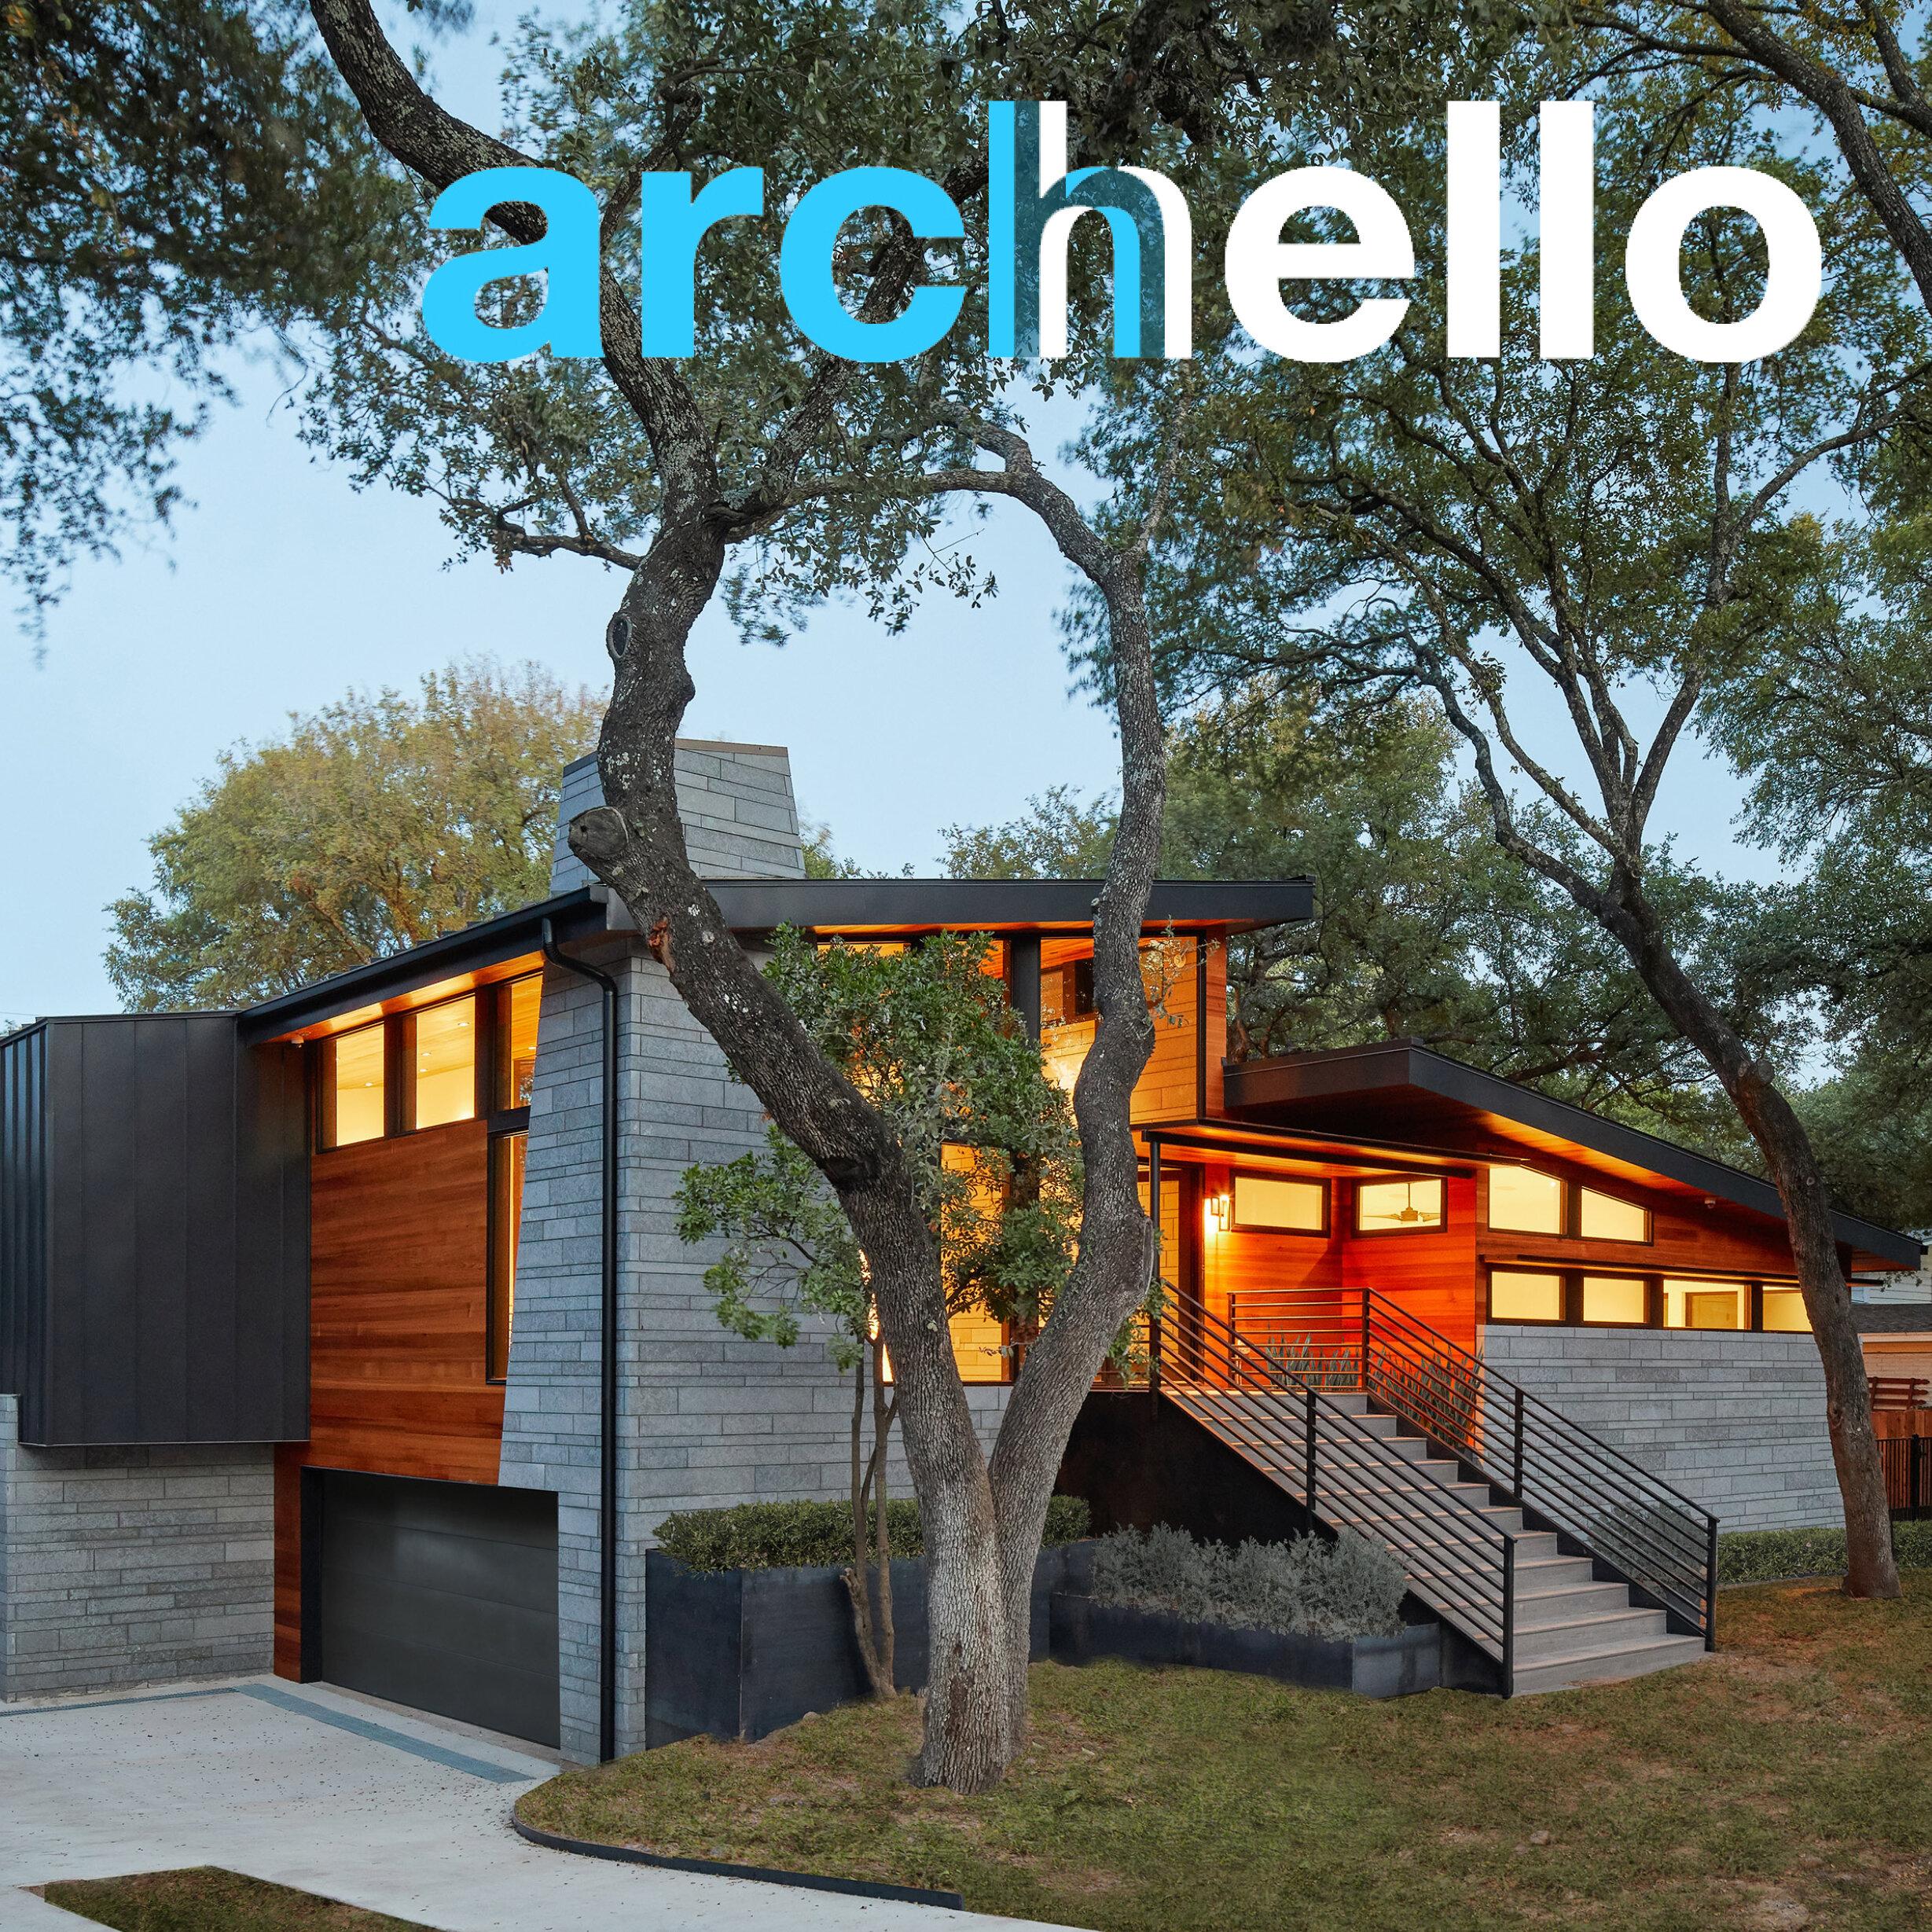 Archello_2019_09_Ridgewood